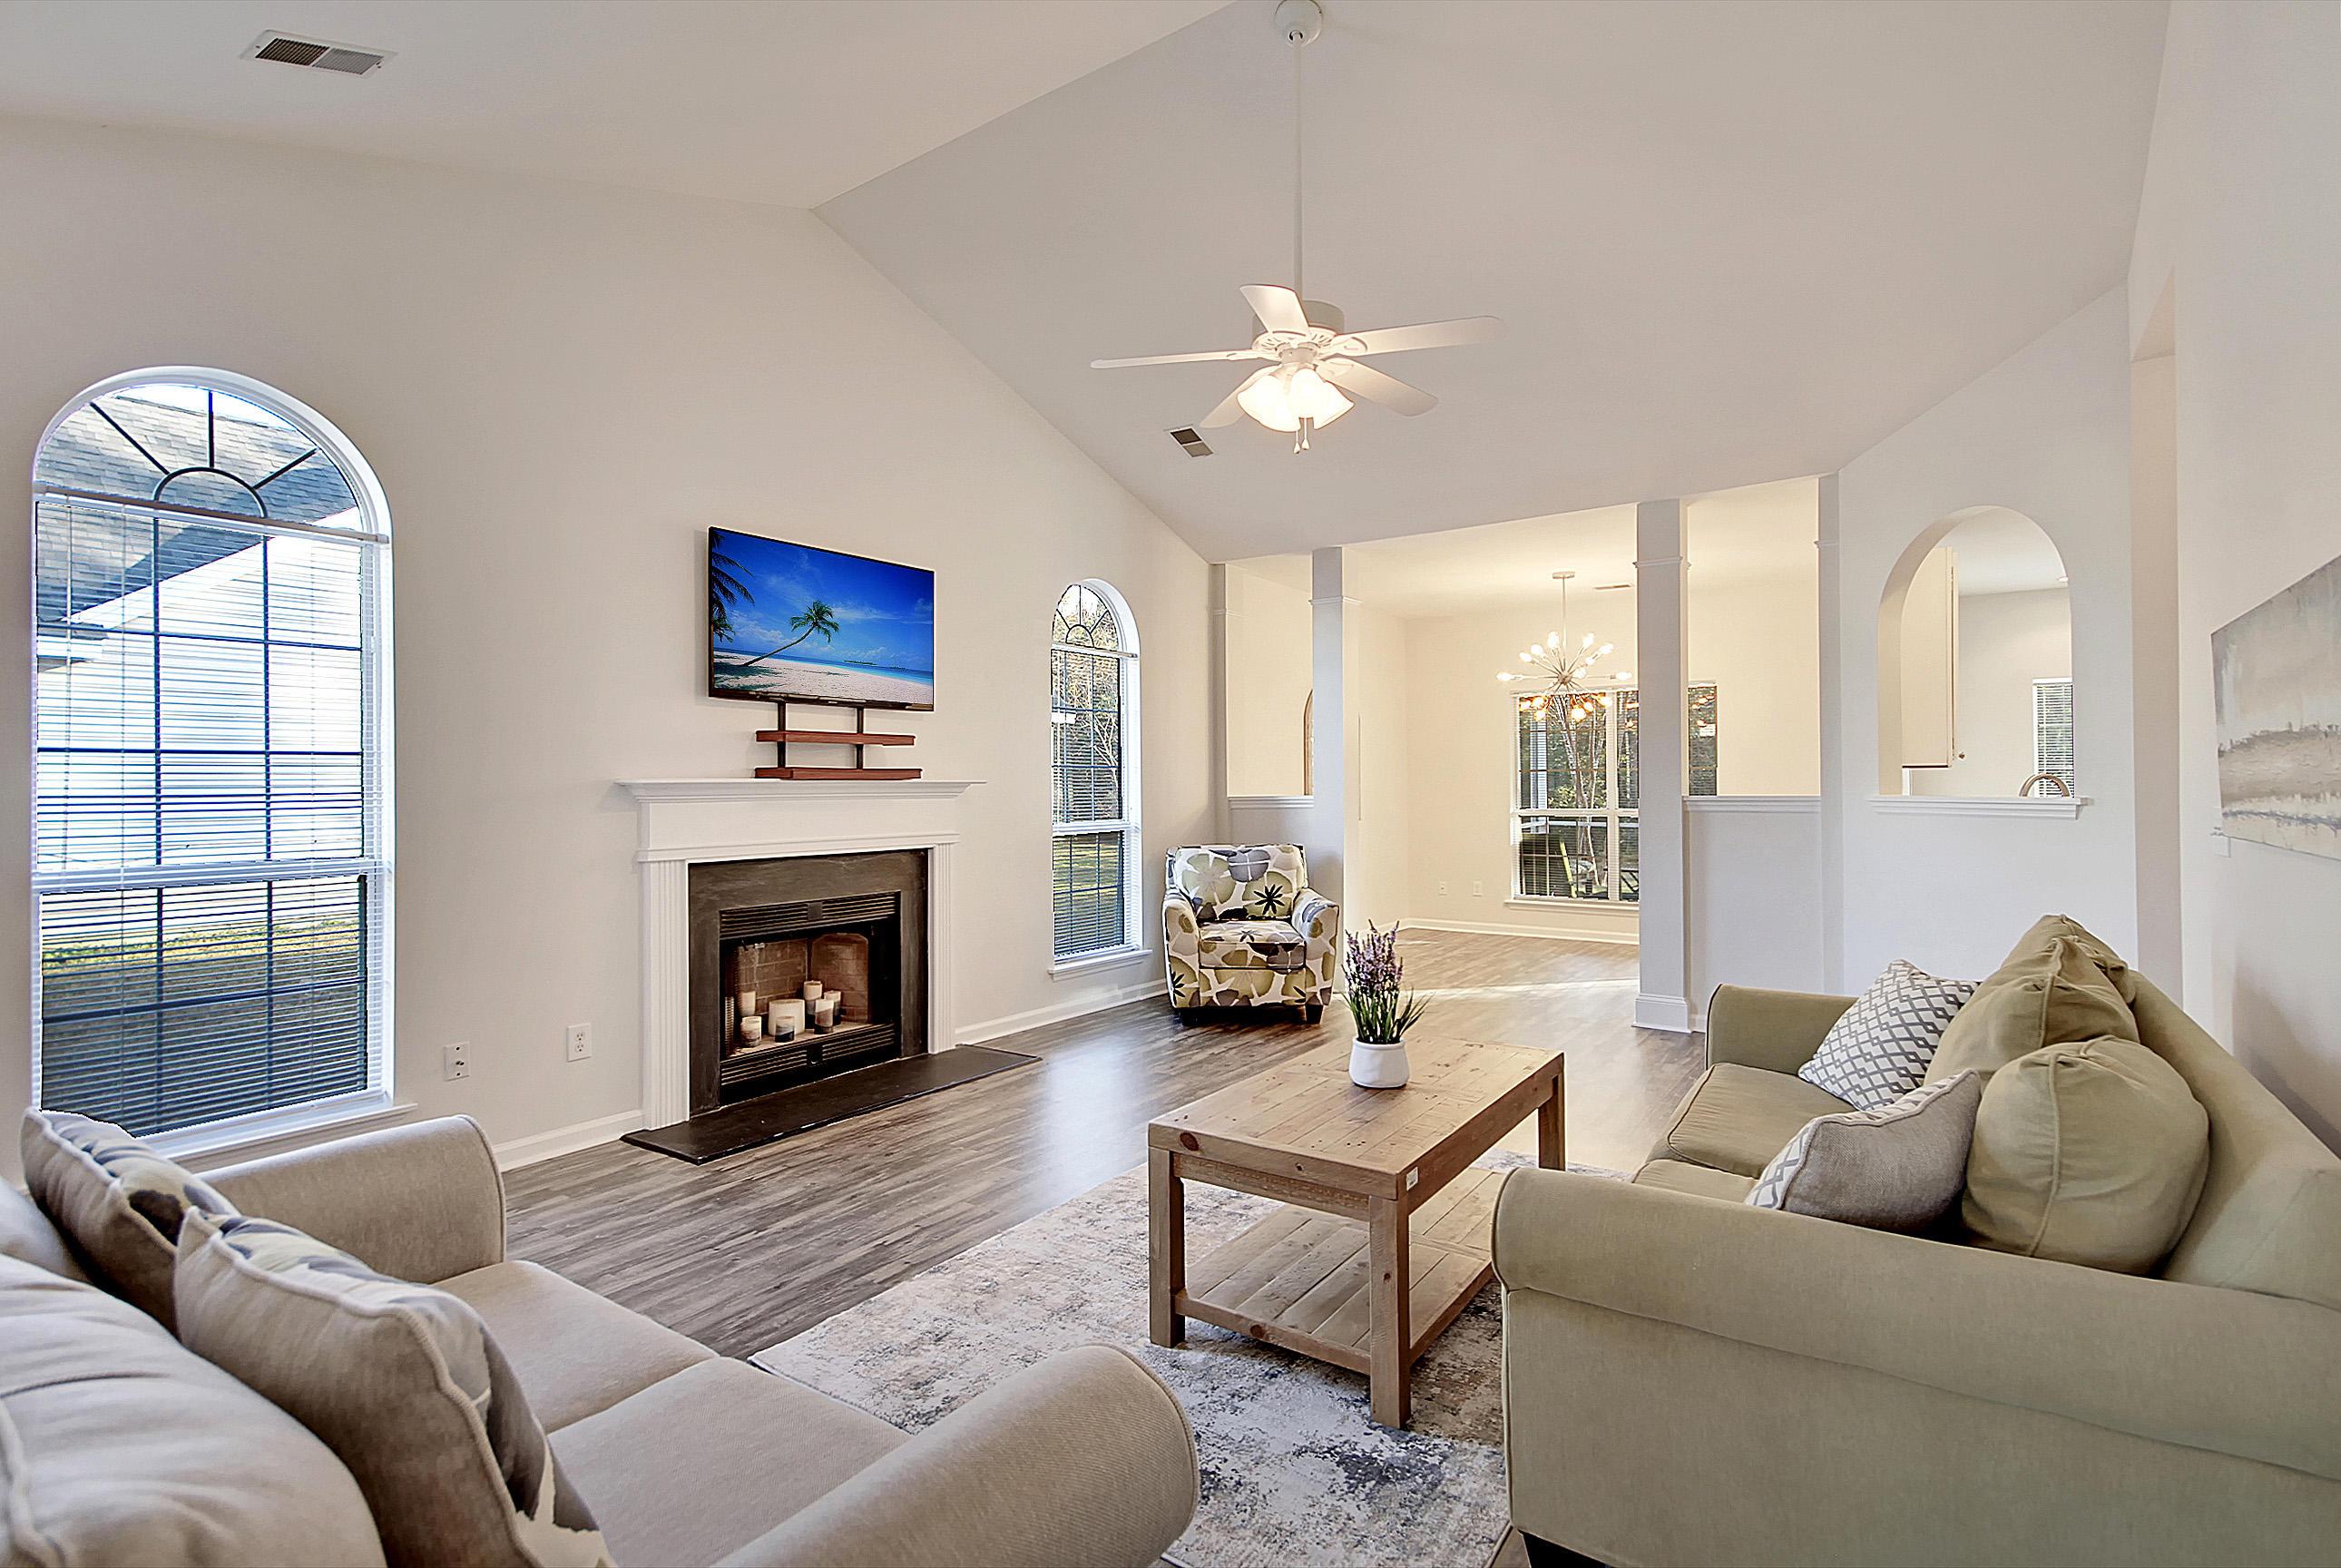 Dunes West Homes For Sale - 2656 Palmetto Hall, Mount Pleasant, SC - 29